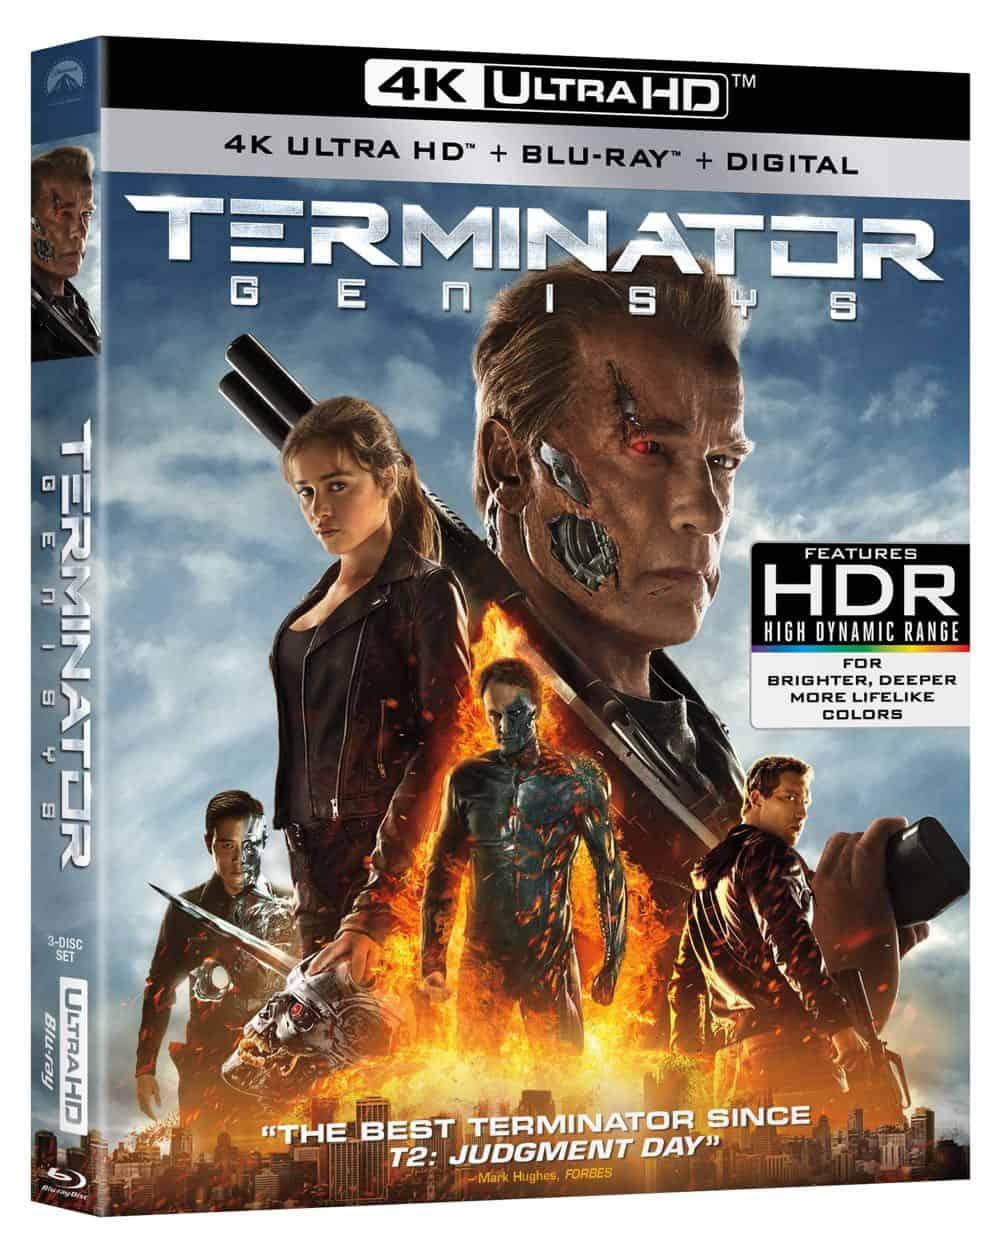 TERMINATOR-GENISYS-4K-Cover1